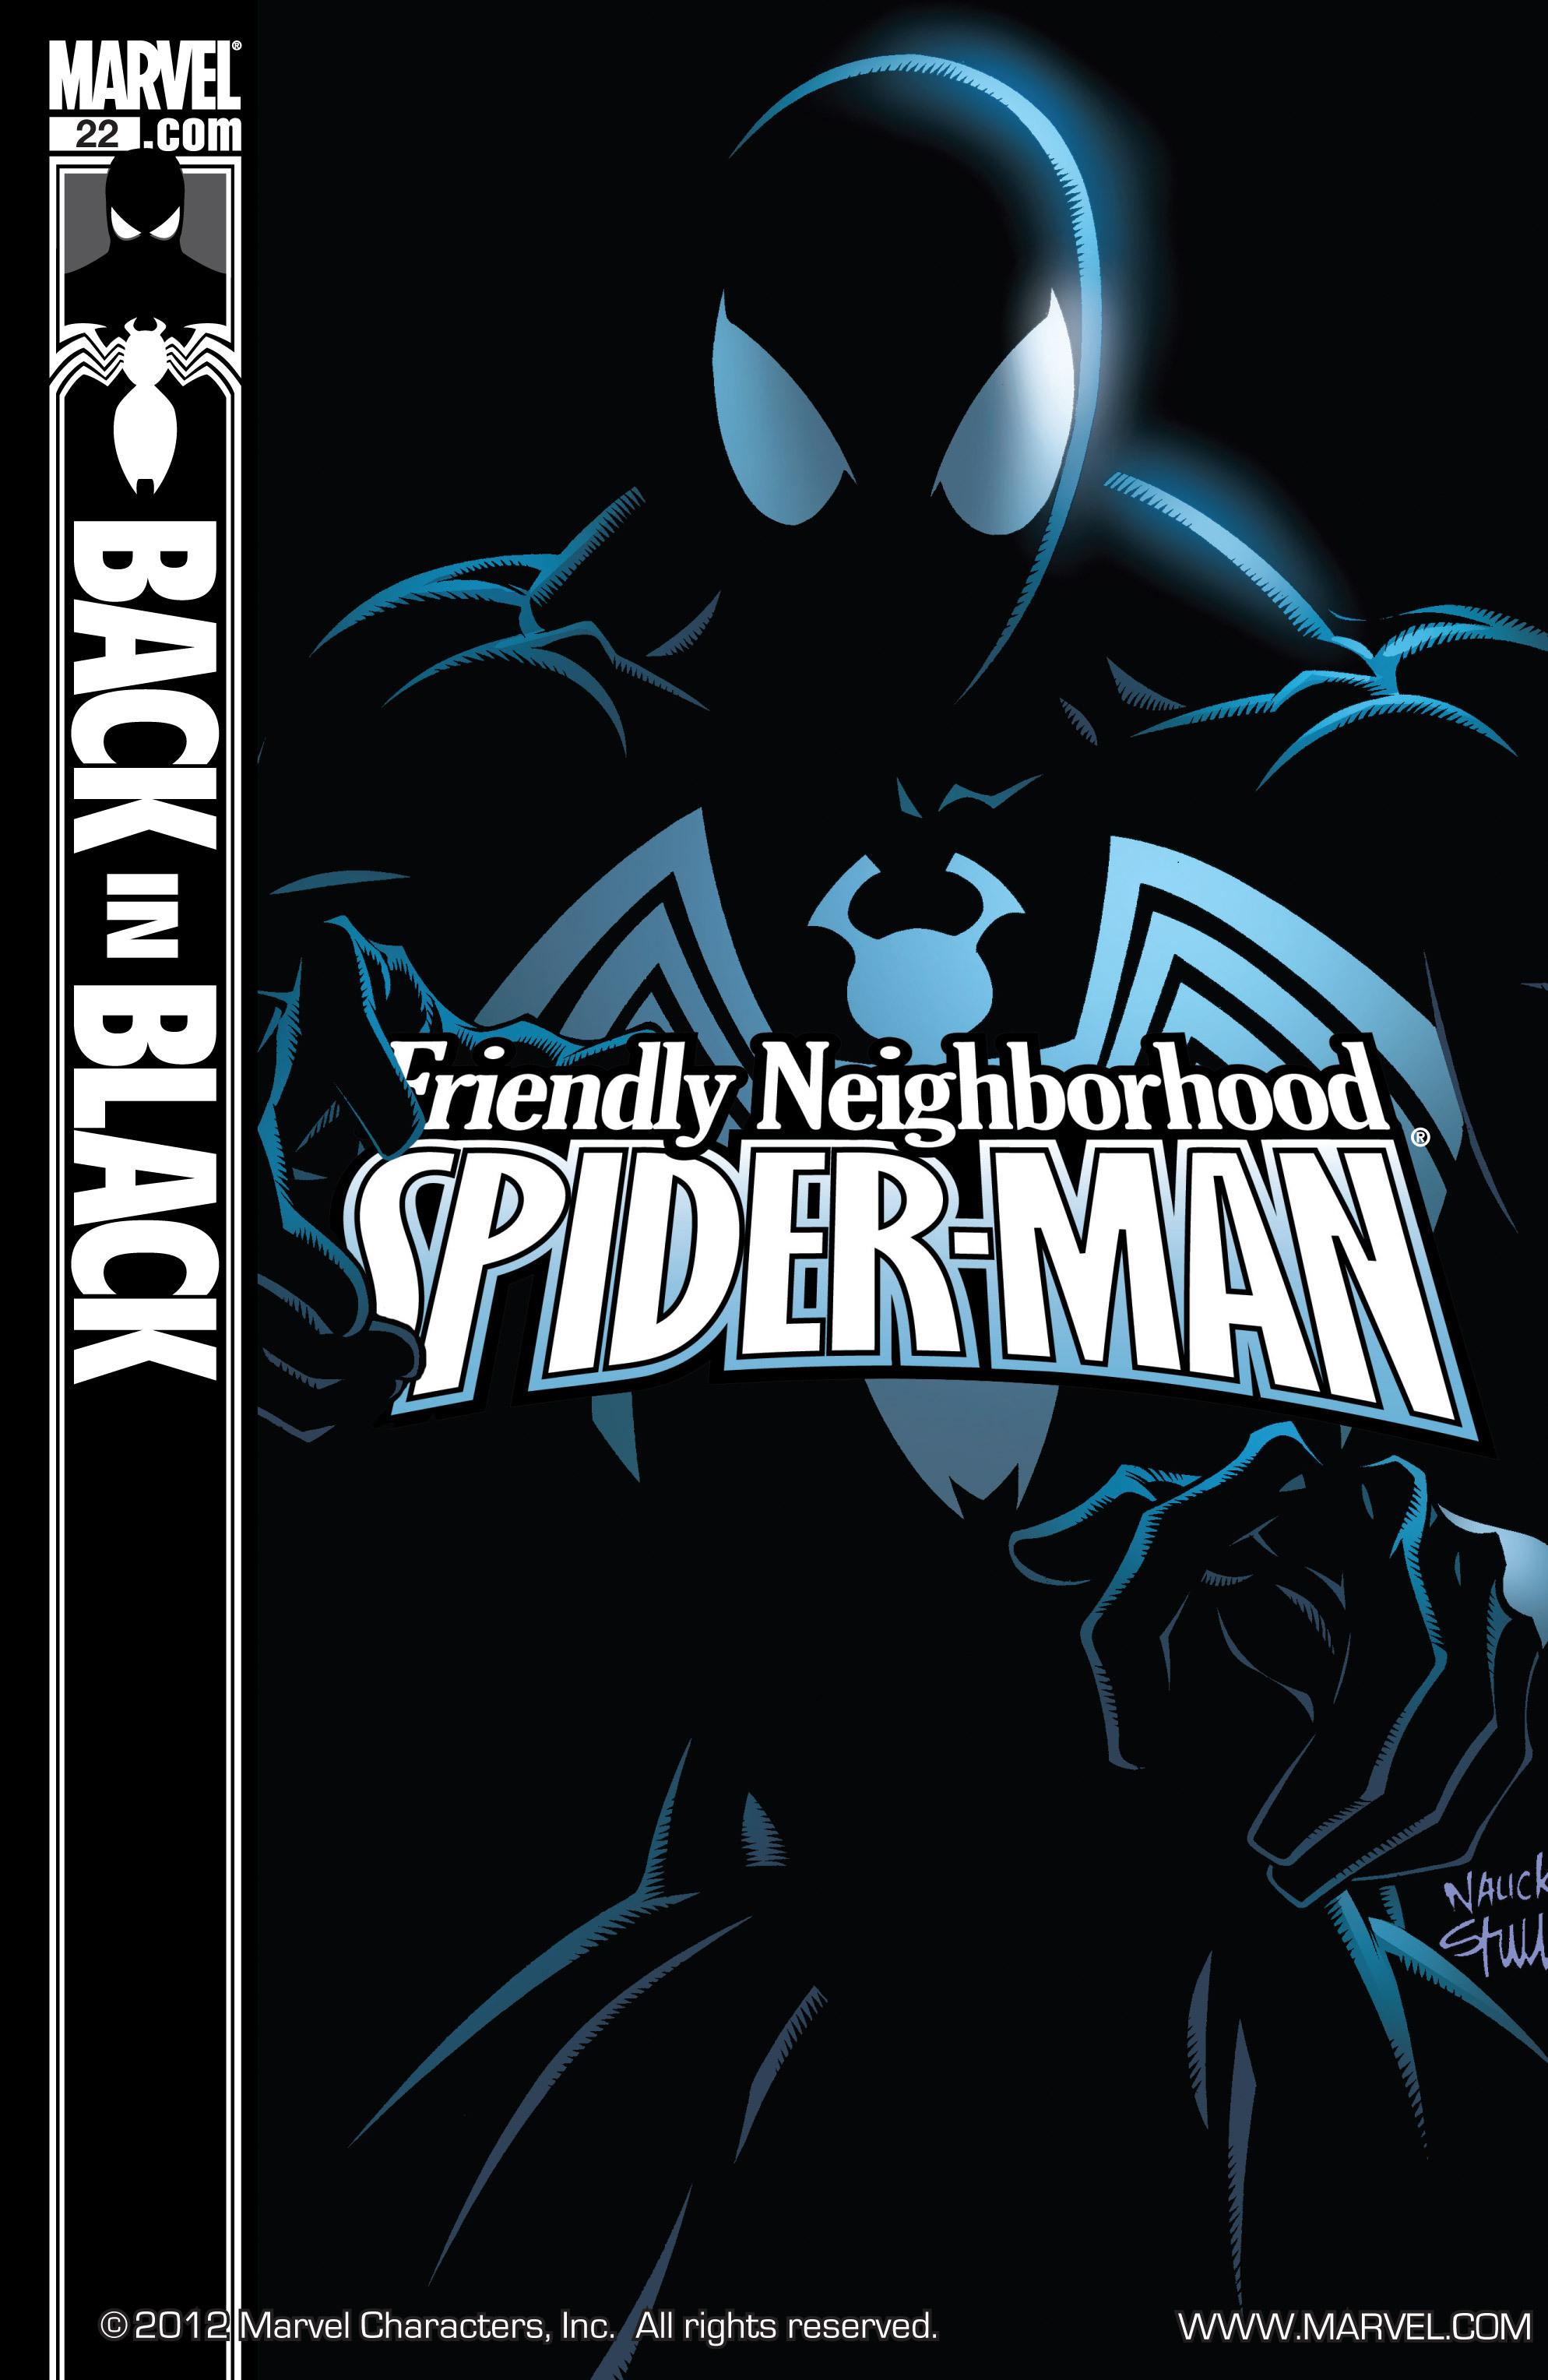 Friendly Neighborhood Spider-Man 22 Page 1